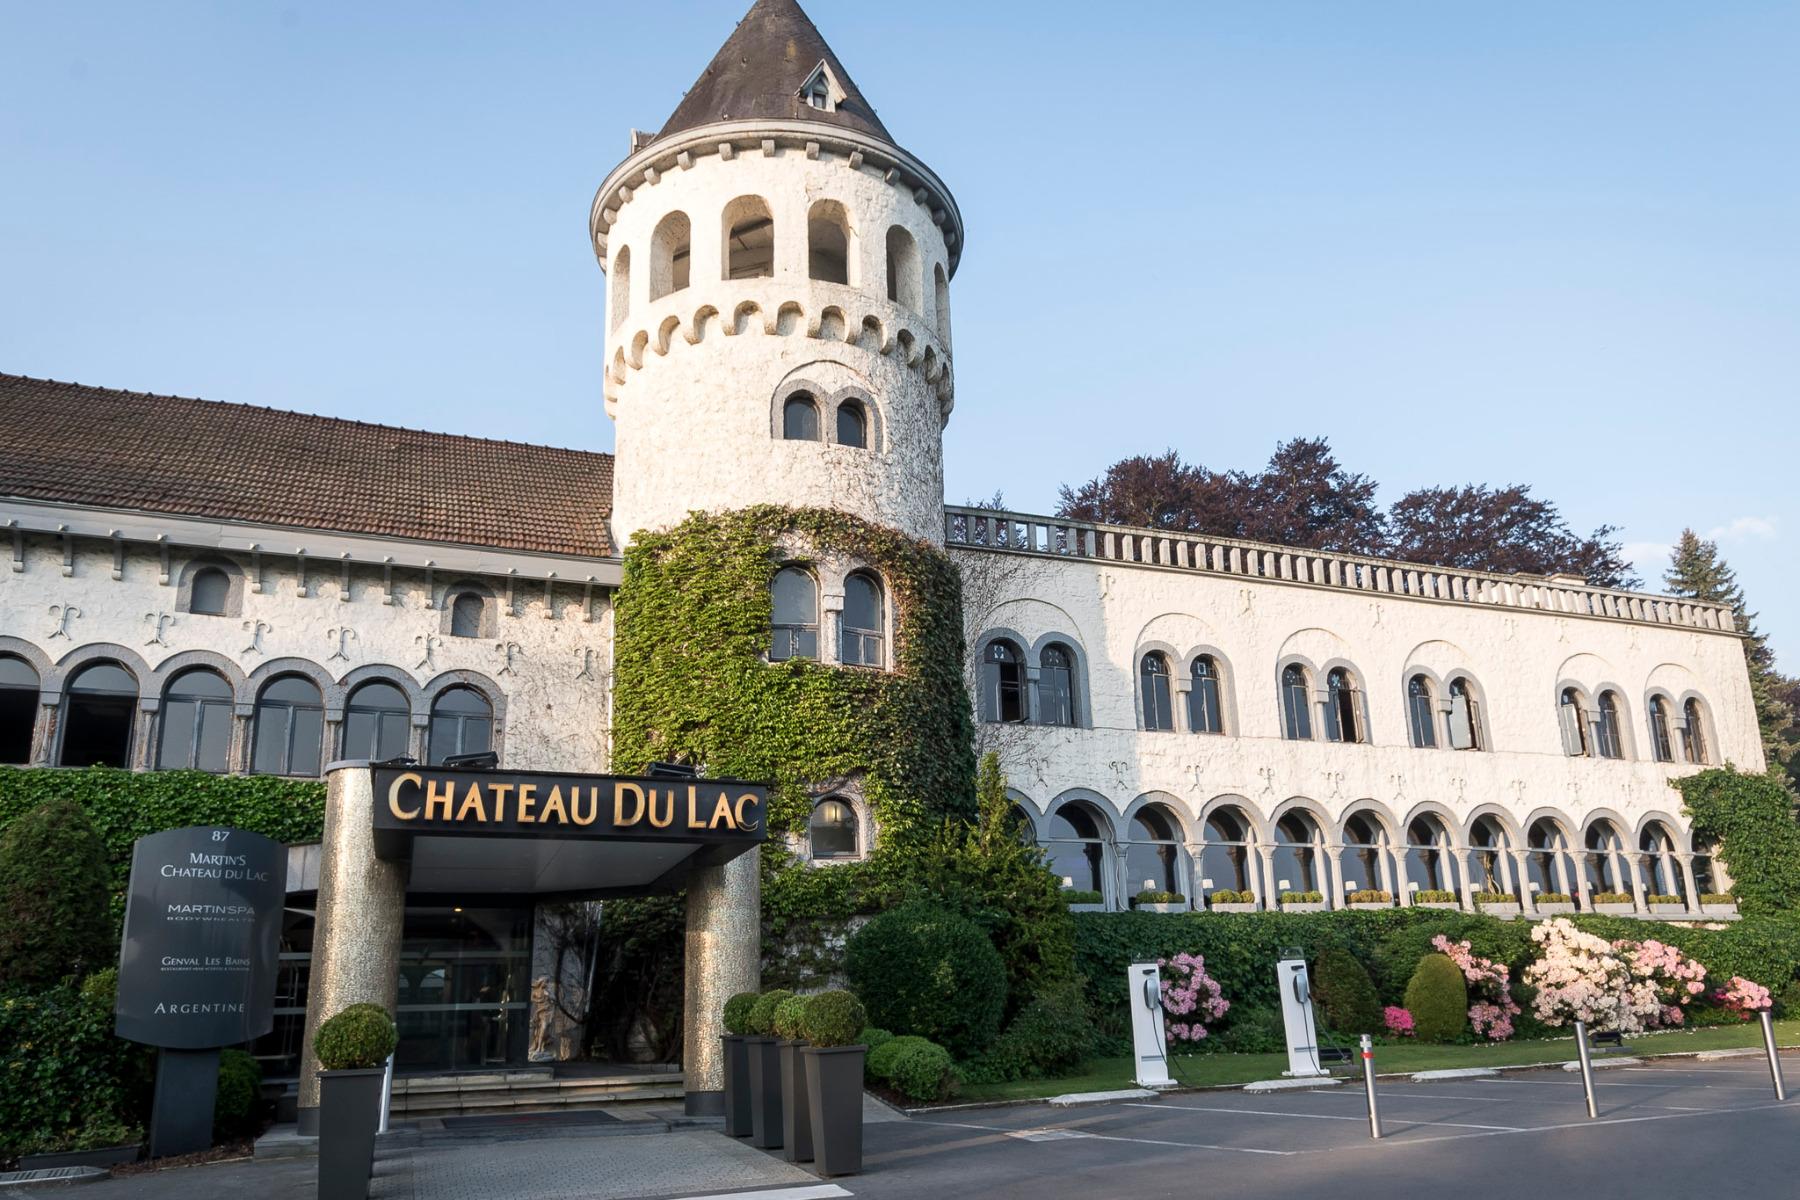 Golf-reizen-Golf-Expedition-België-Regio-Brussel-Martins-Chateau-du-Lac-main-entrance